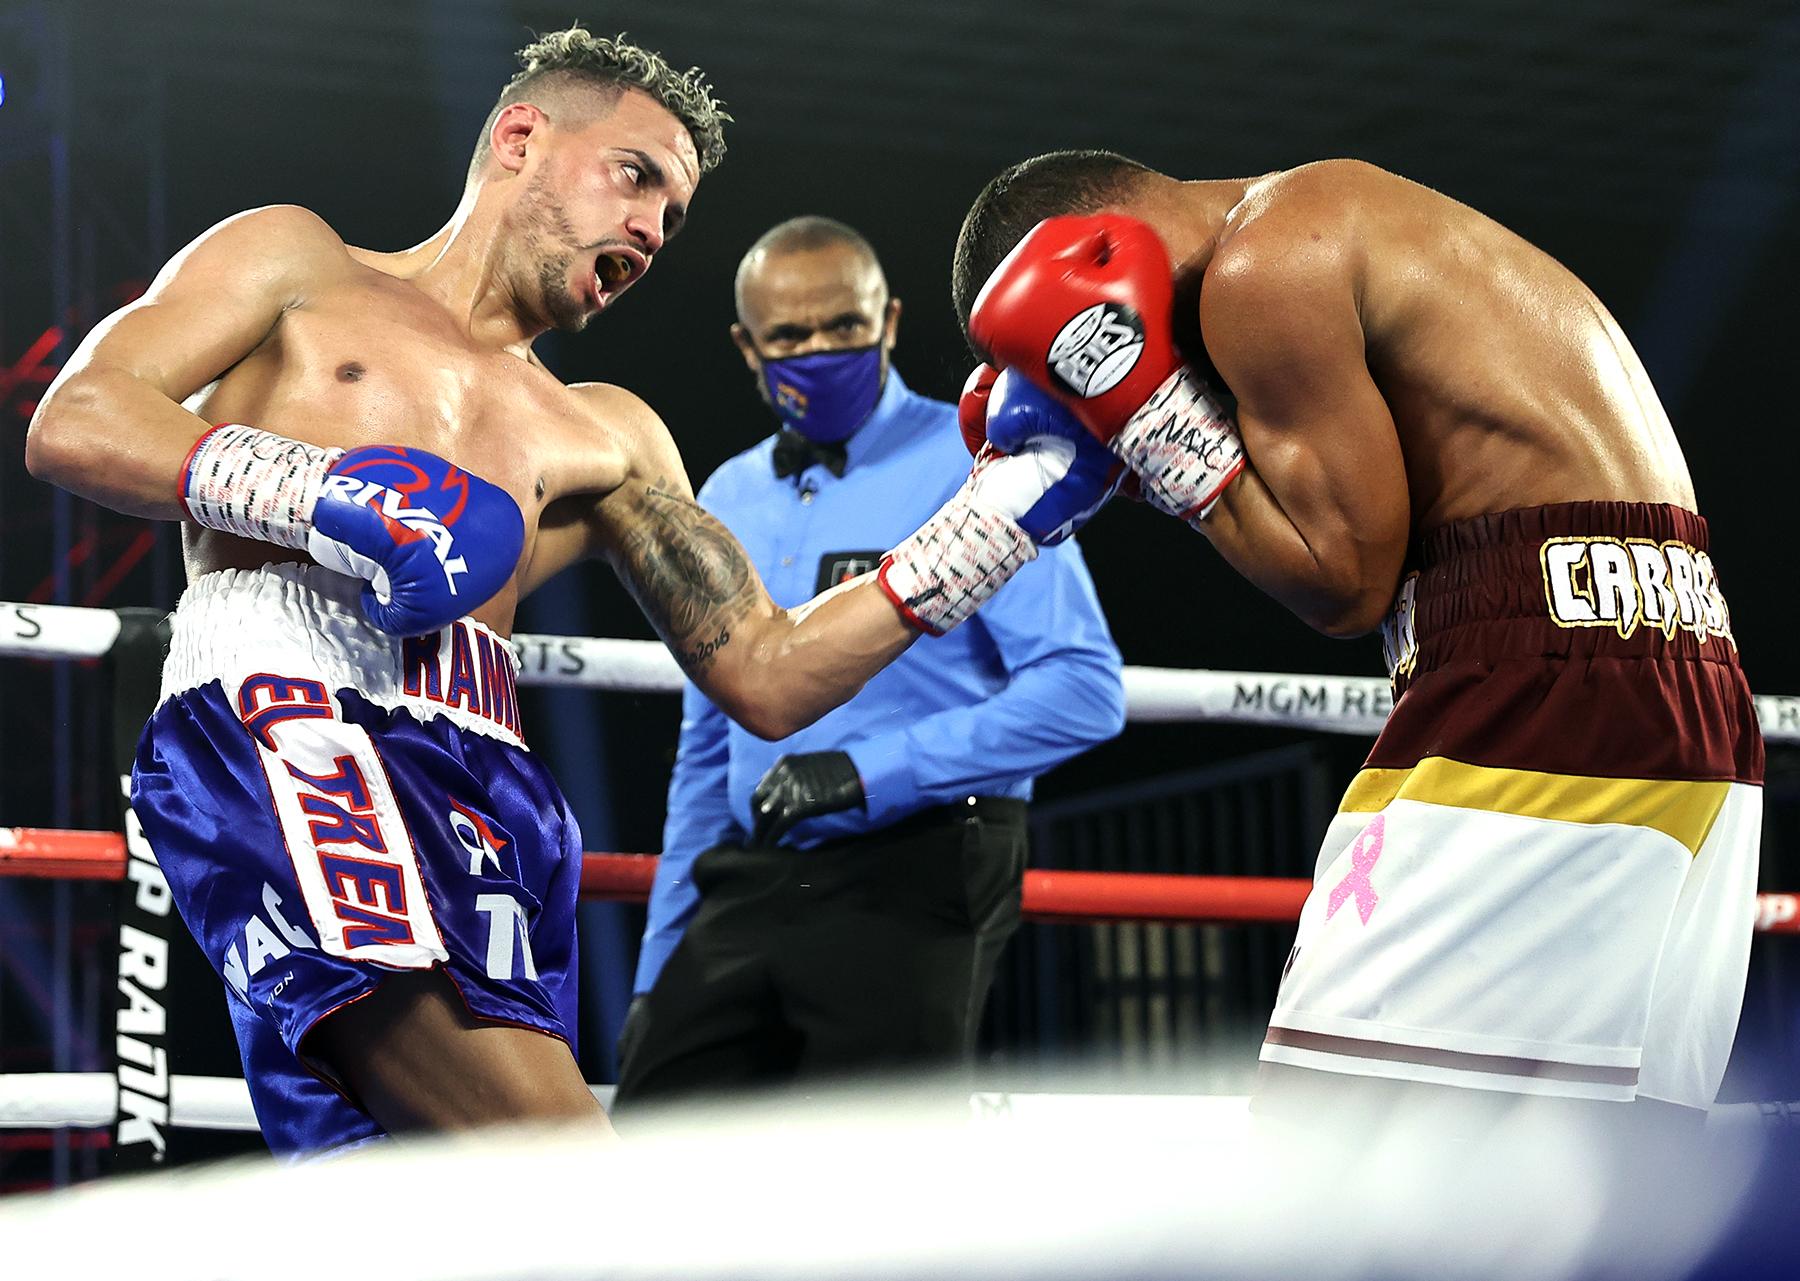 Robeisy Ramirez (left) vs. Felix Caraballo. Photo by Mikey Williams/Top Rank